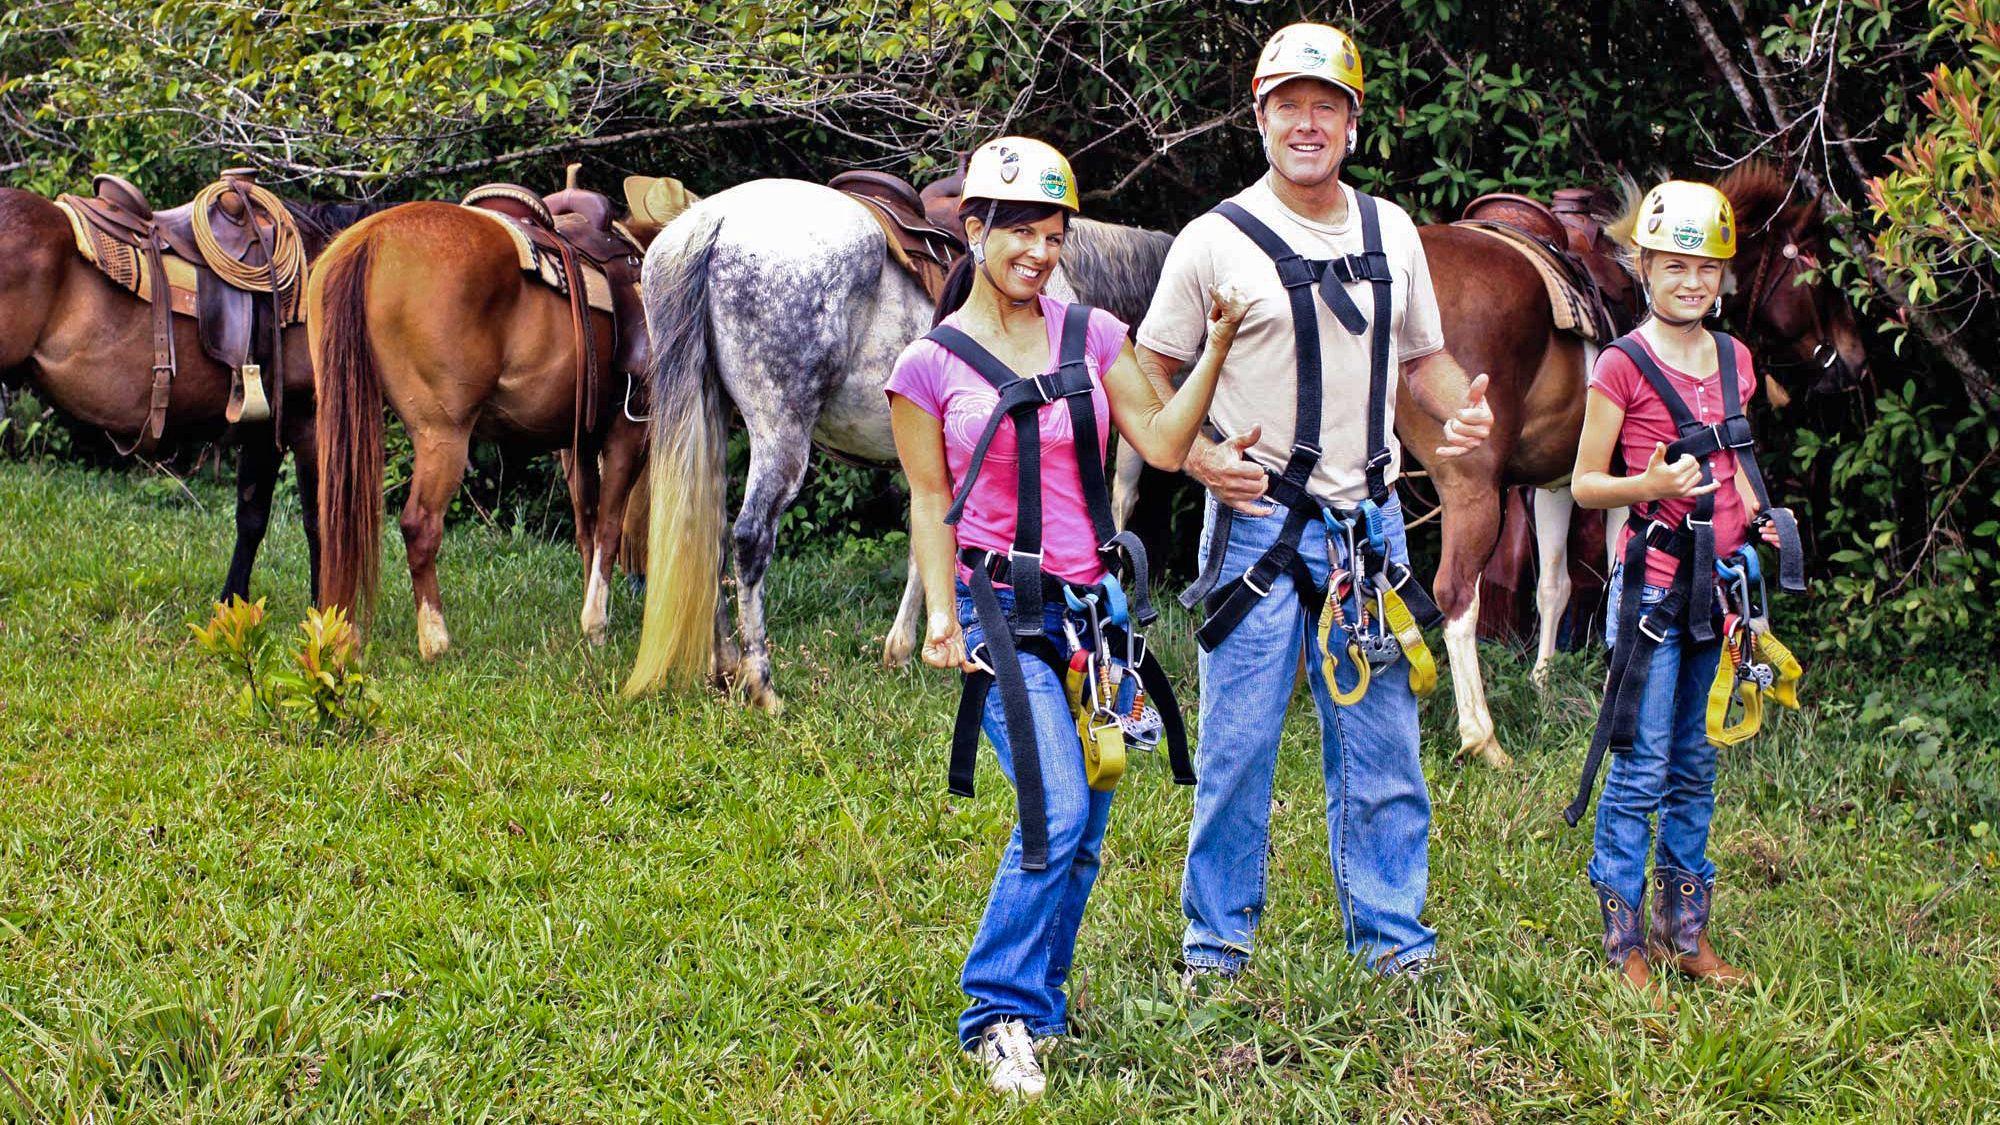 group ready for zip lining near horses in Kauai